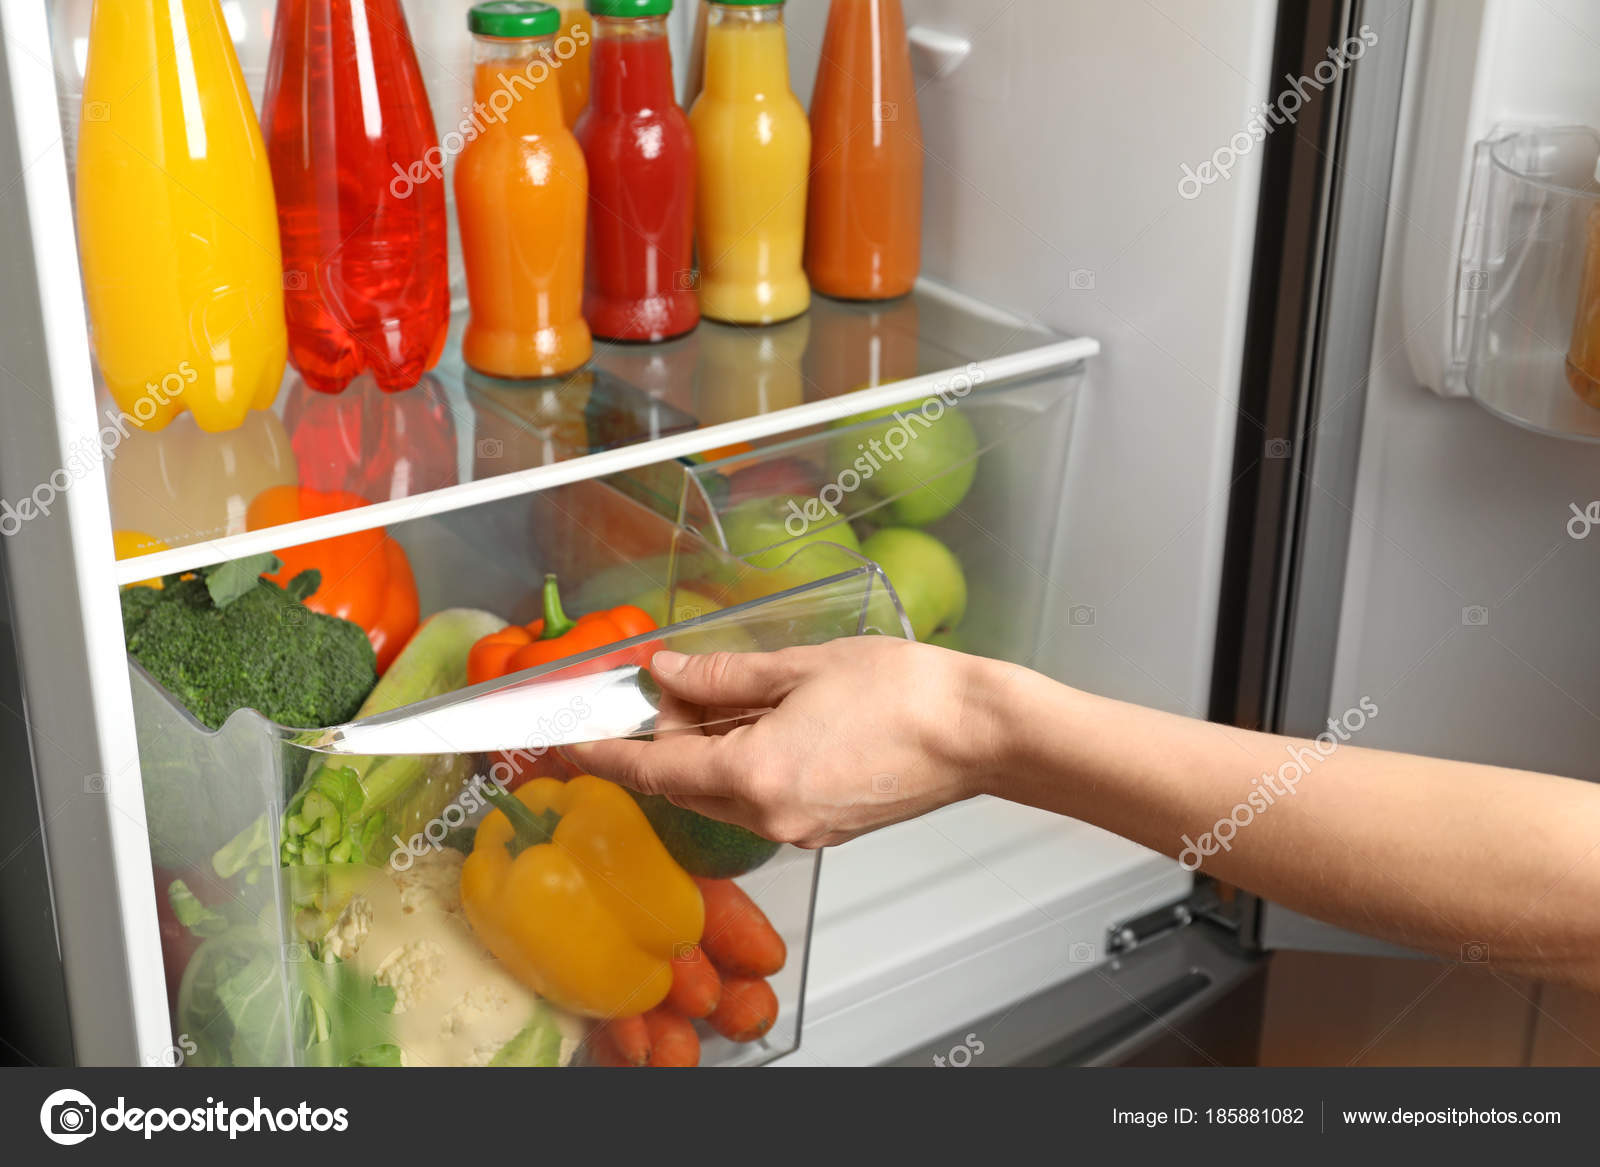 Kühlschrank Schublade : Frau eröffnung schublade kühlschrank mit gemüse u2014 stockfoto